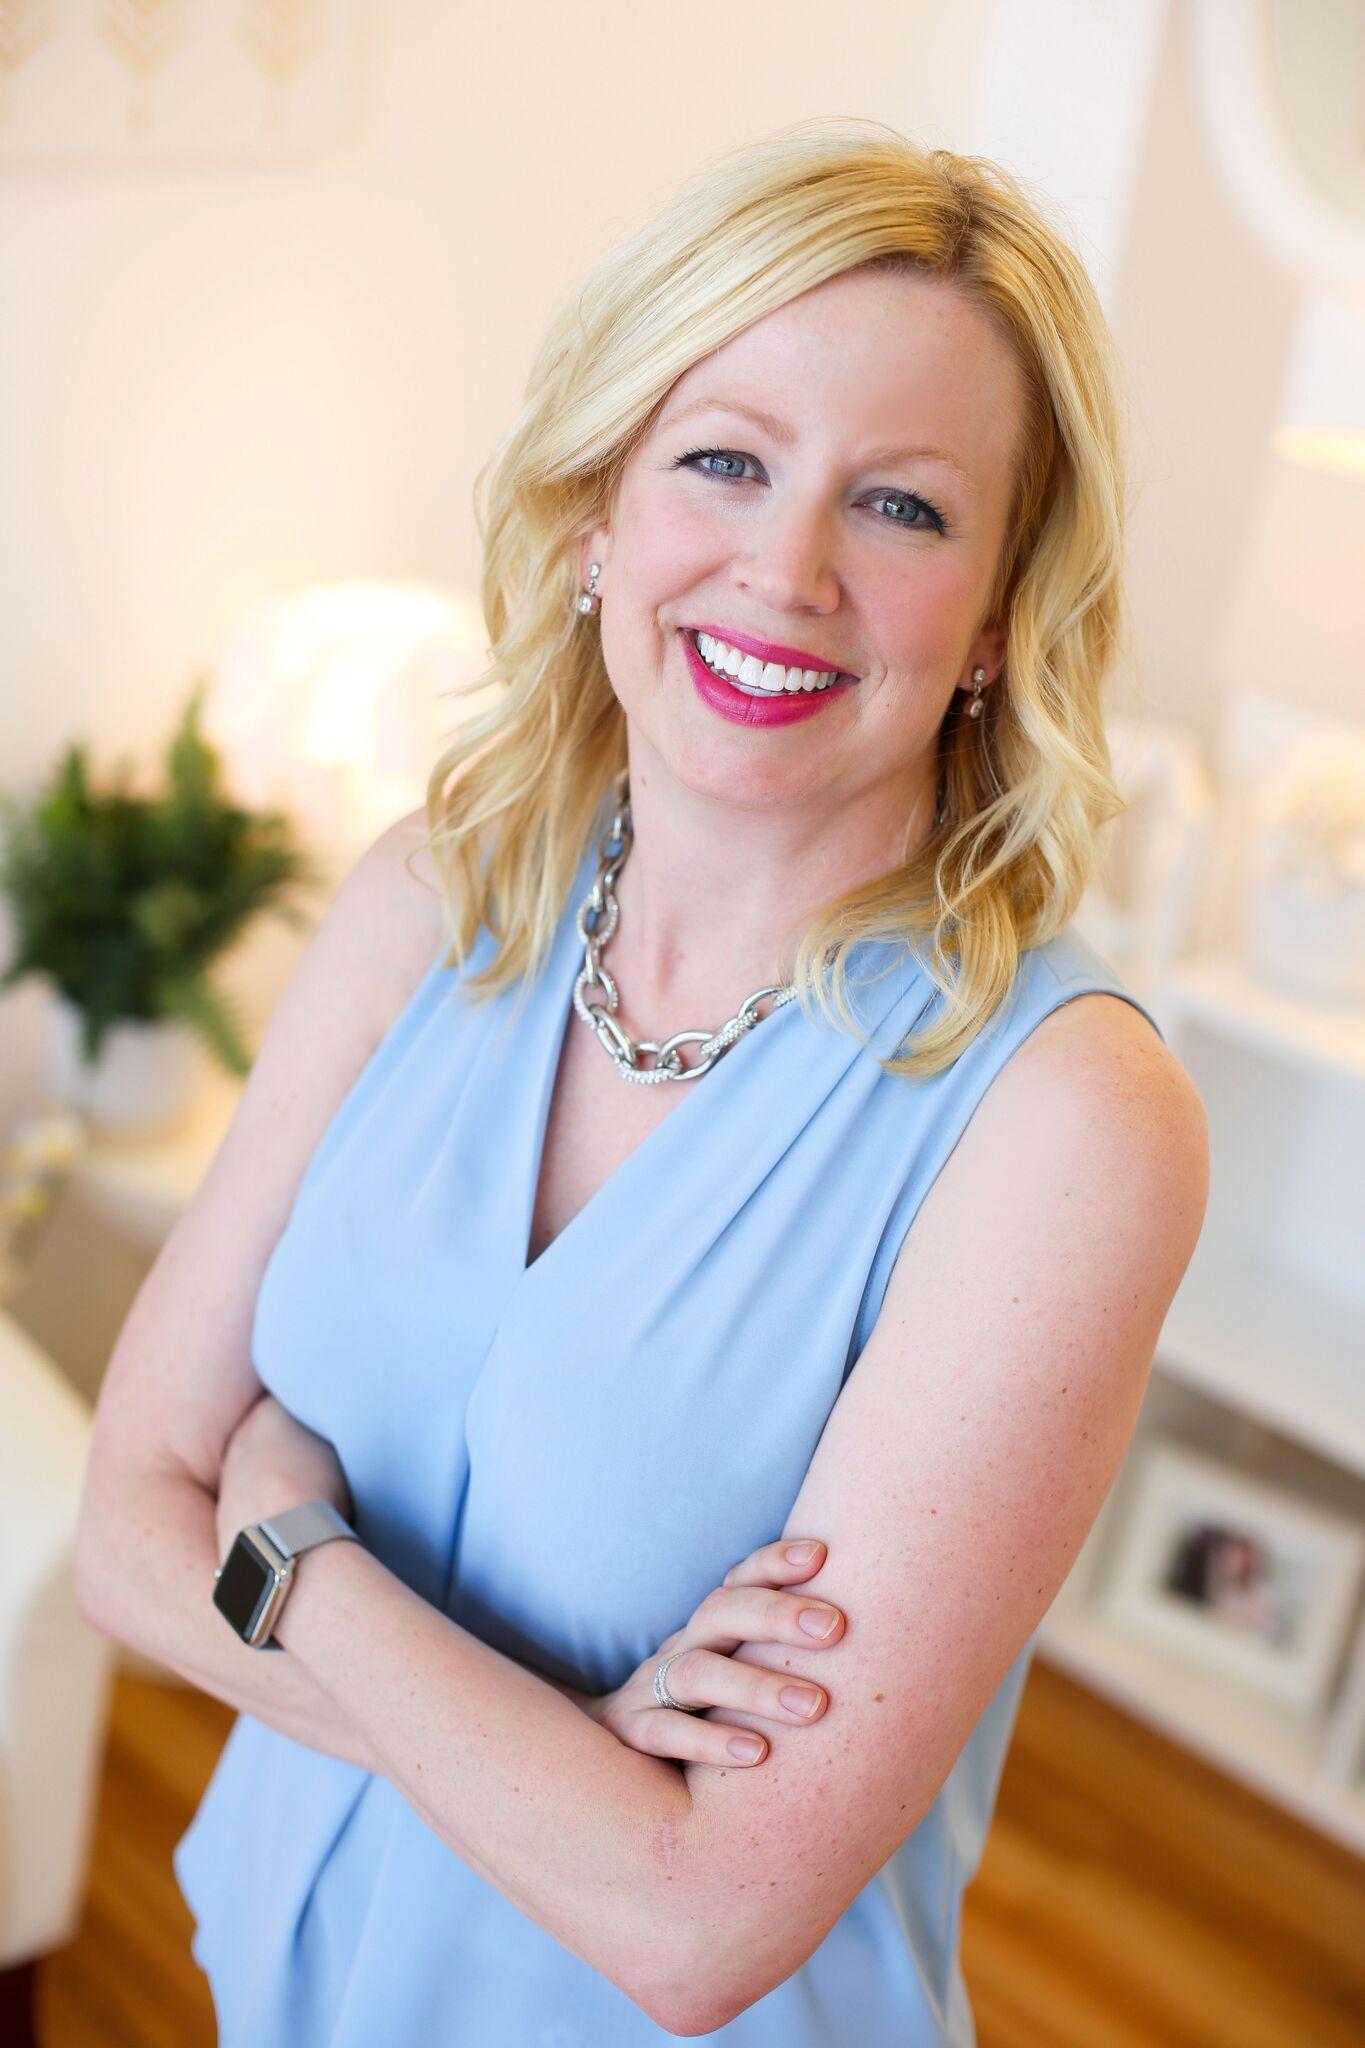 Dr. Monica Neely